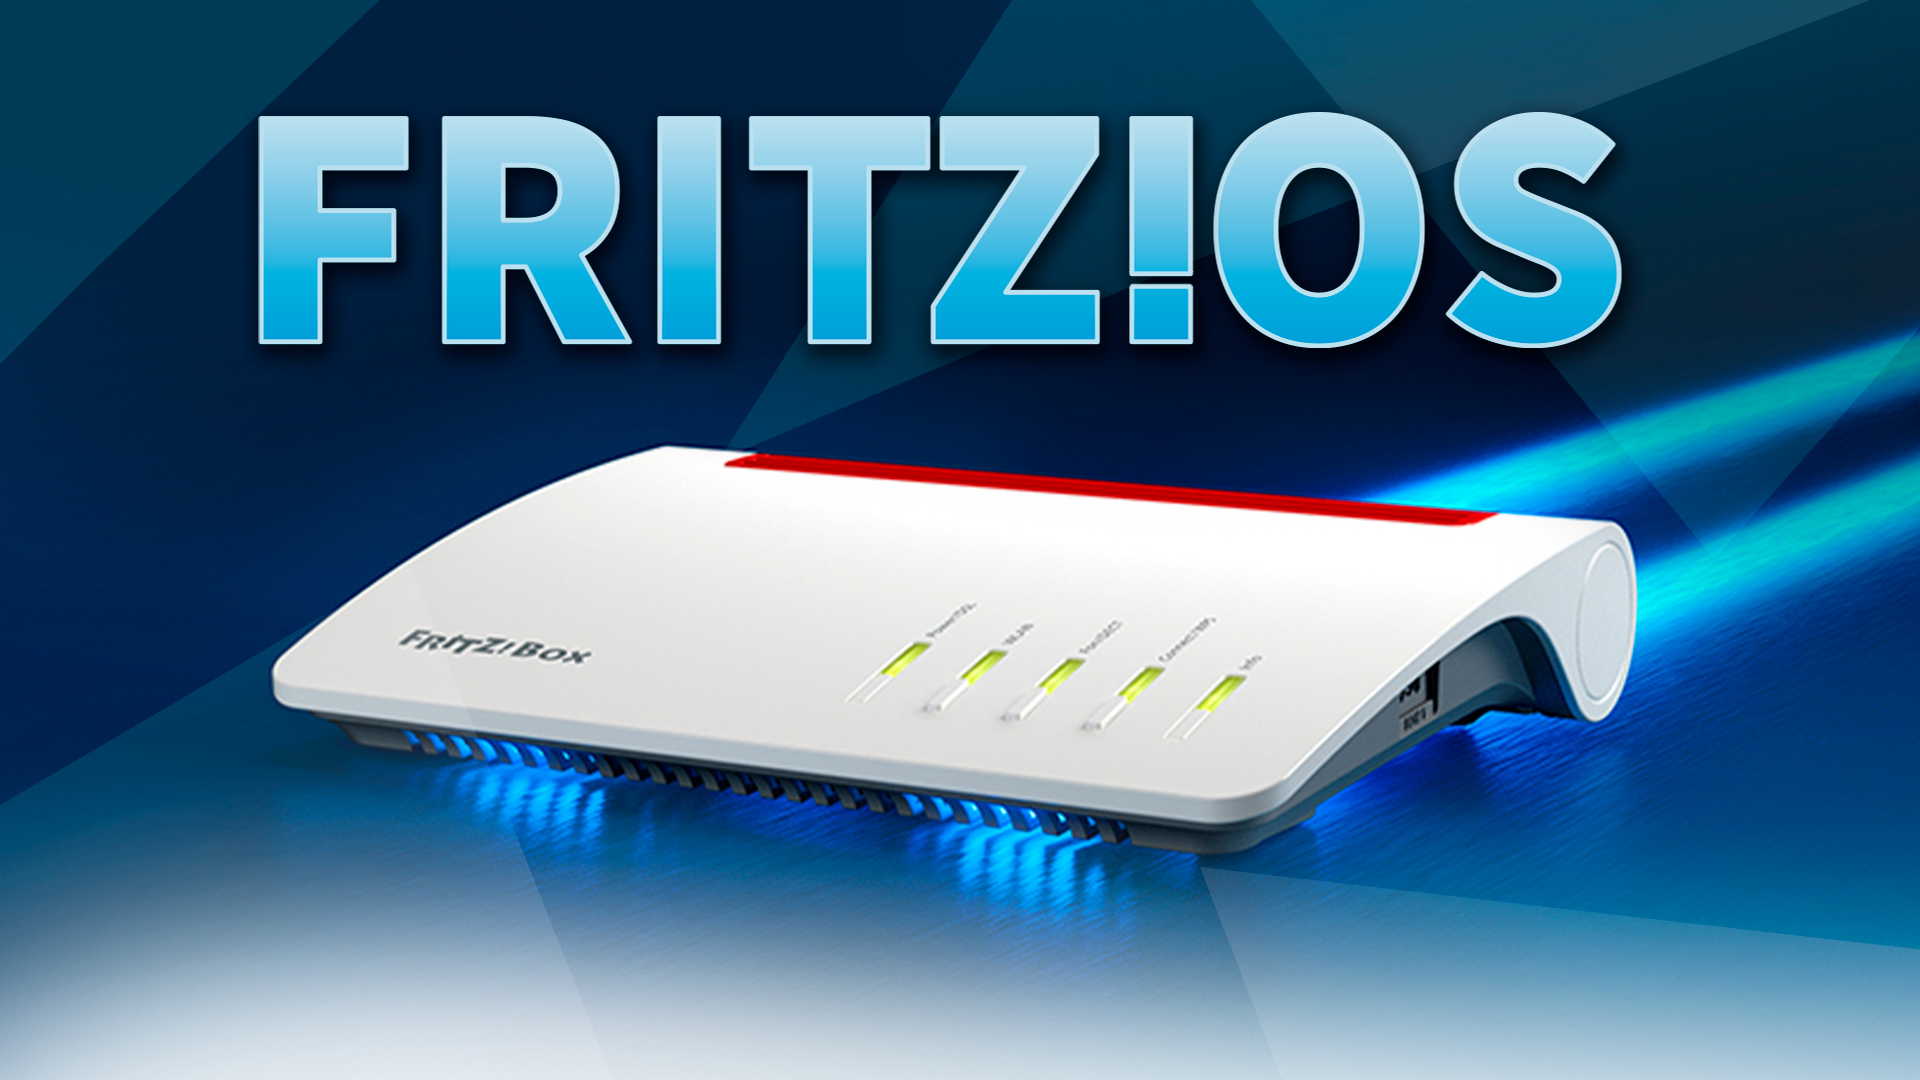 Avm, Fritzbox, FritzOS, Fritz!box, Fritz!, Fritz!OS